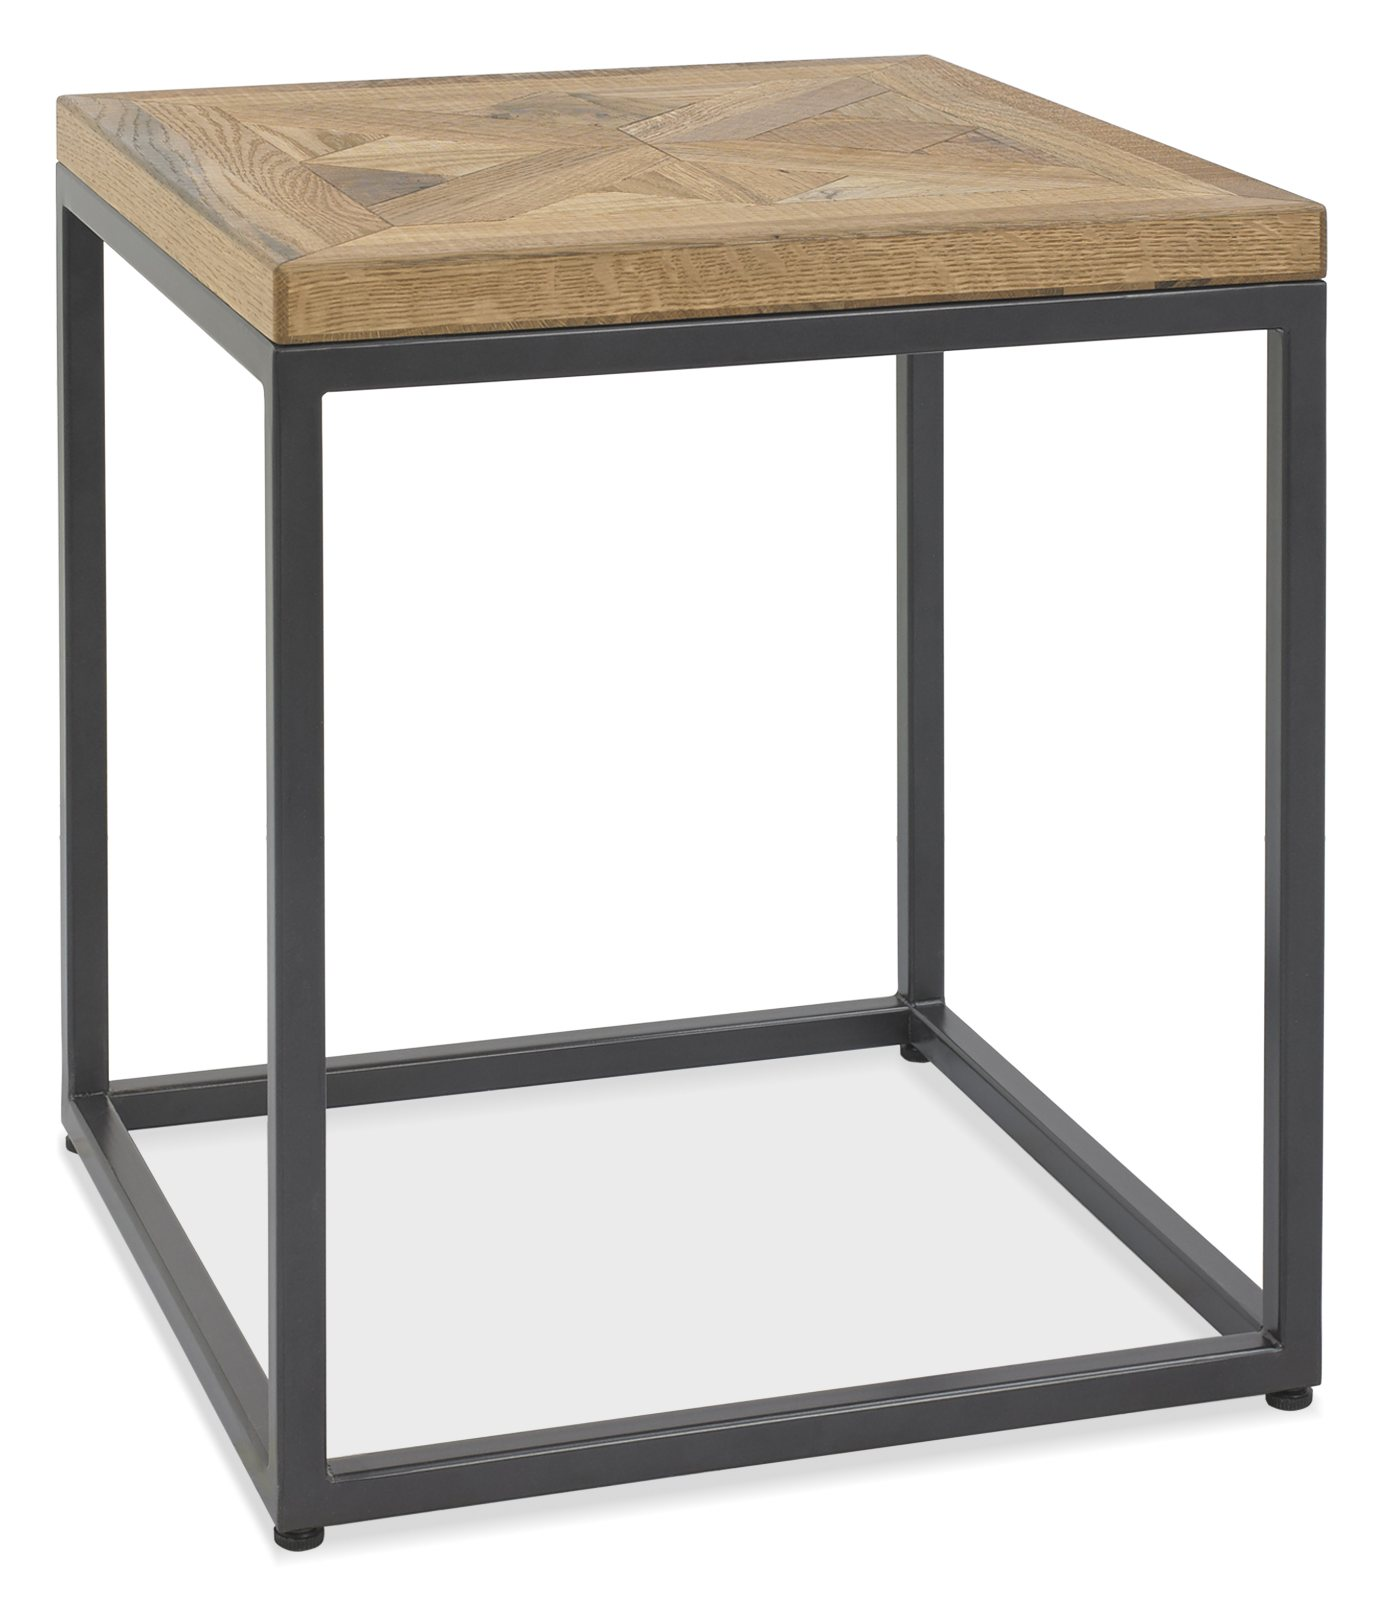 Indus Rustic Oak Lamp Table